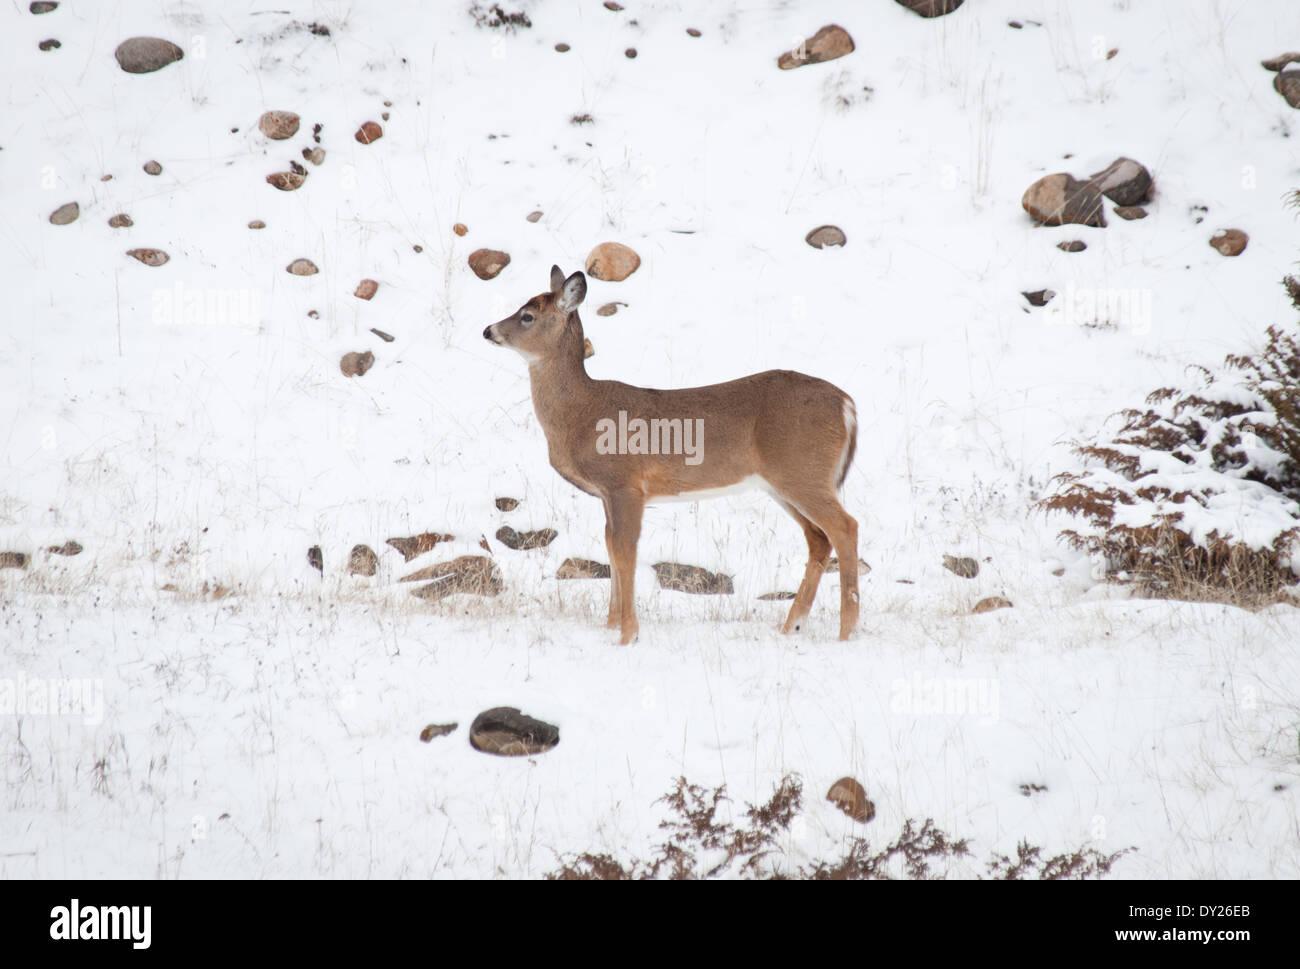 A female Mule deer (Odocoileus hemionus) in winter in Jasper National Park, Alberta, Canada. Stock Photo